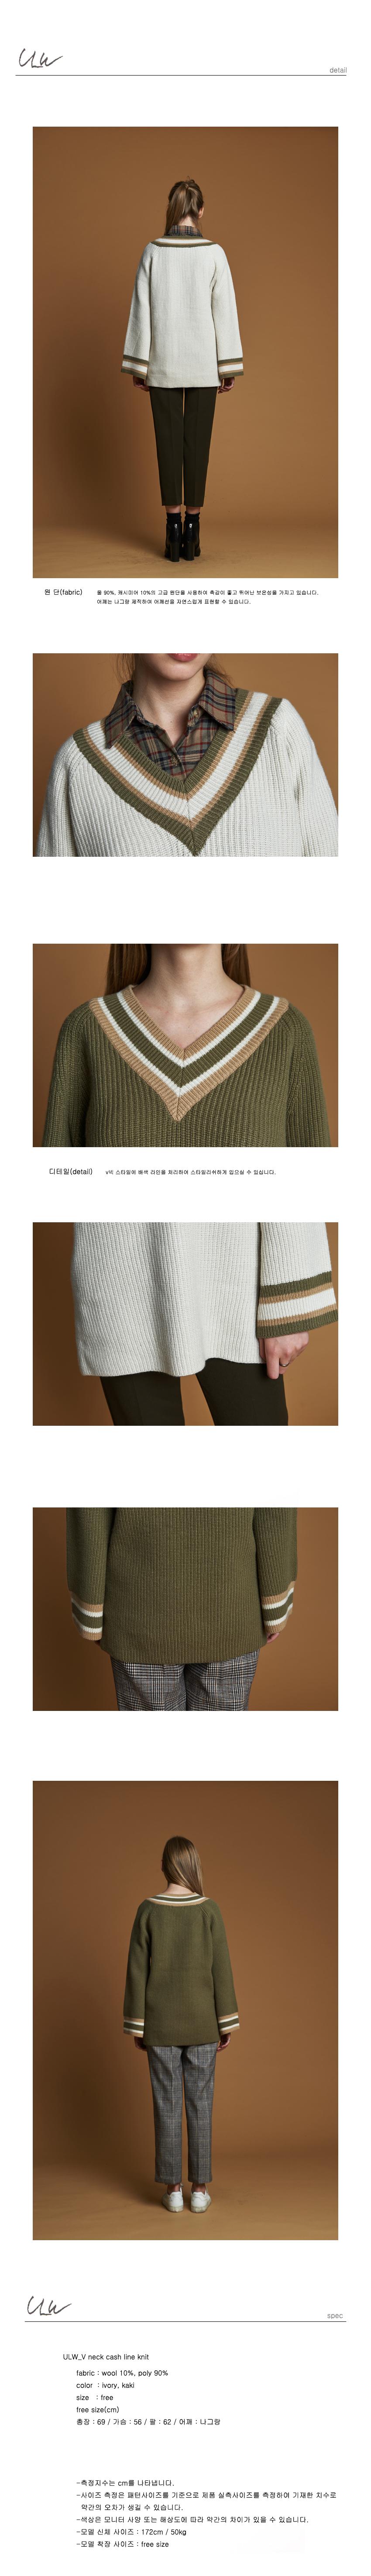 ulw_V-neck-cash-line-knit_2.jpg